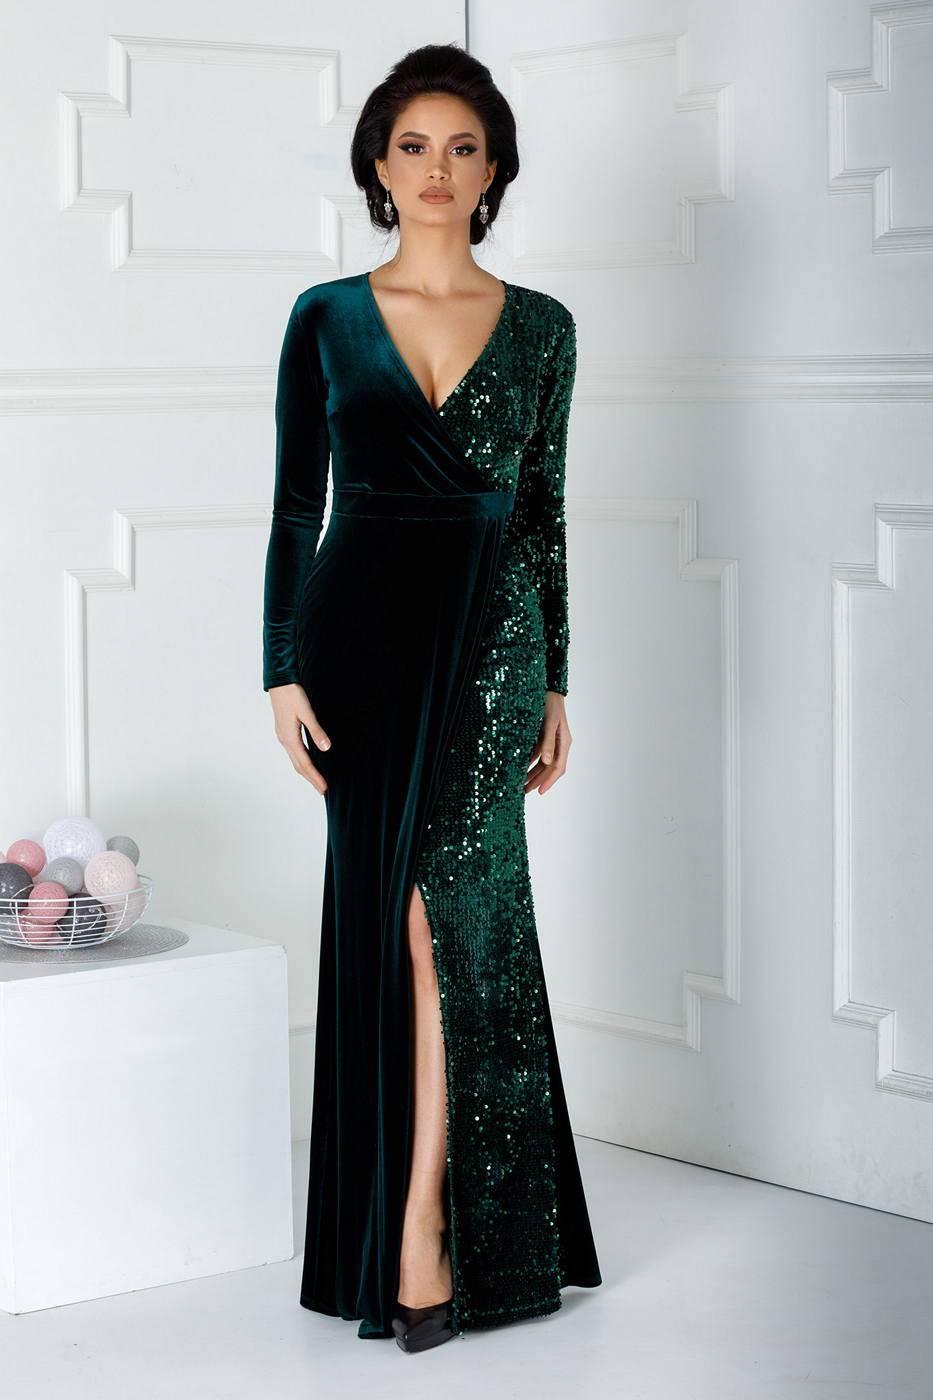 Swan Green Dress